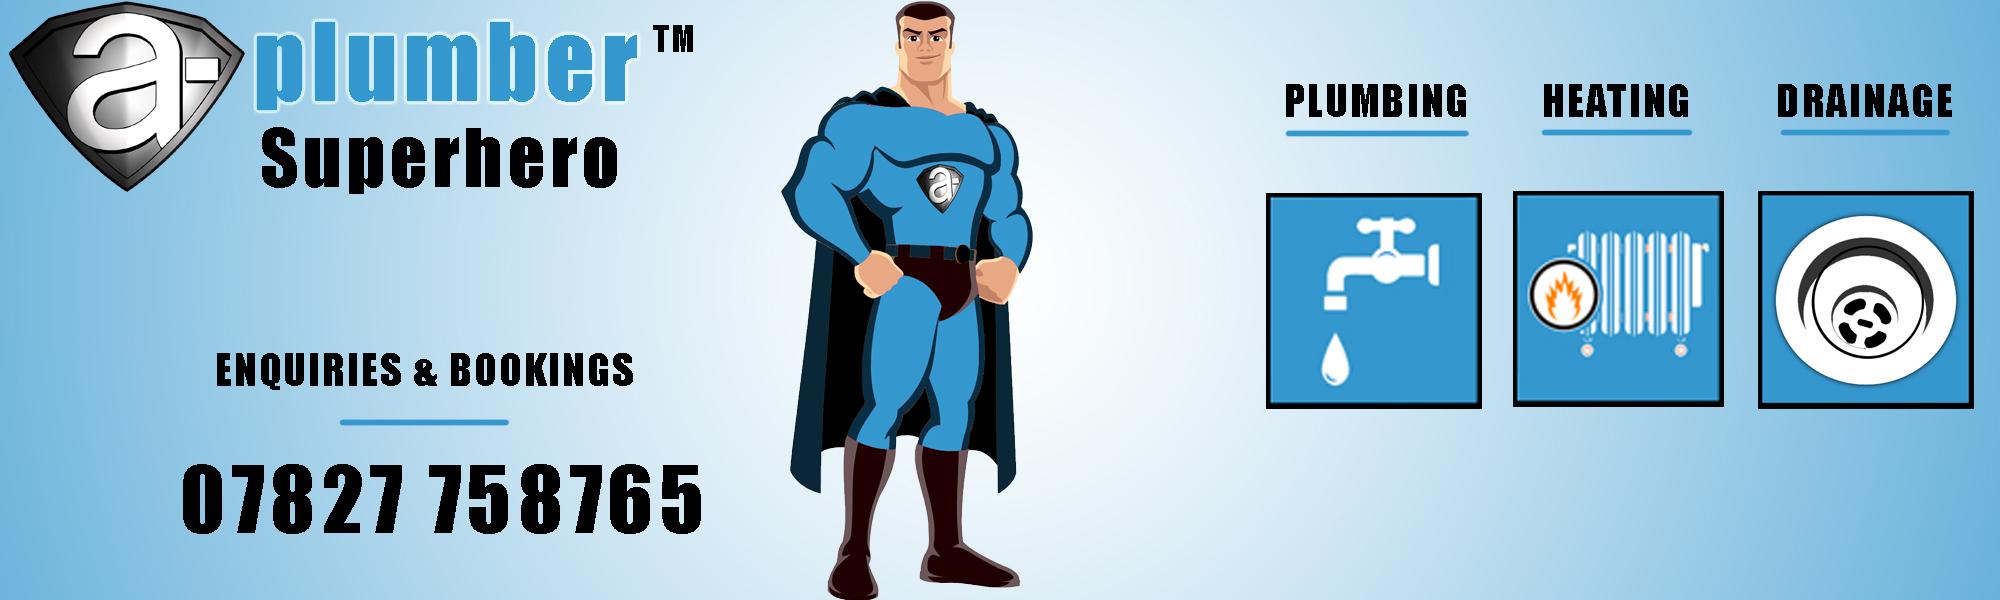 A Gas Safe Superhero Superhero Gas Safe Heating Engineers In The Uk